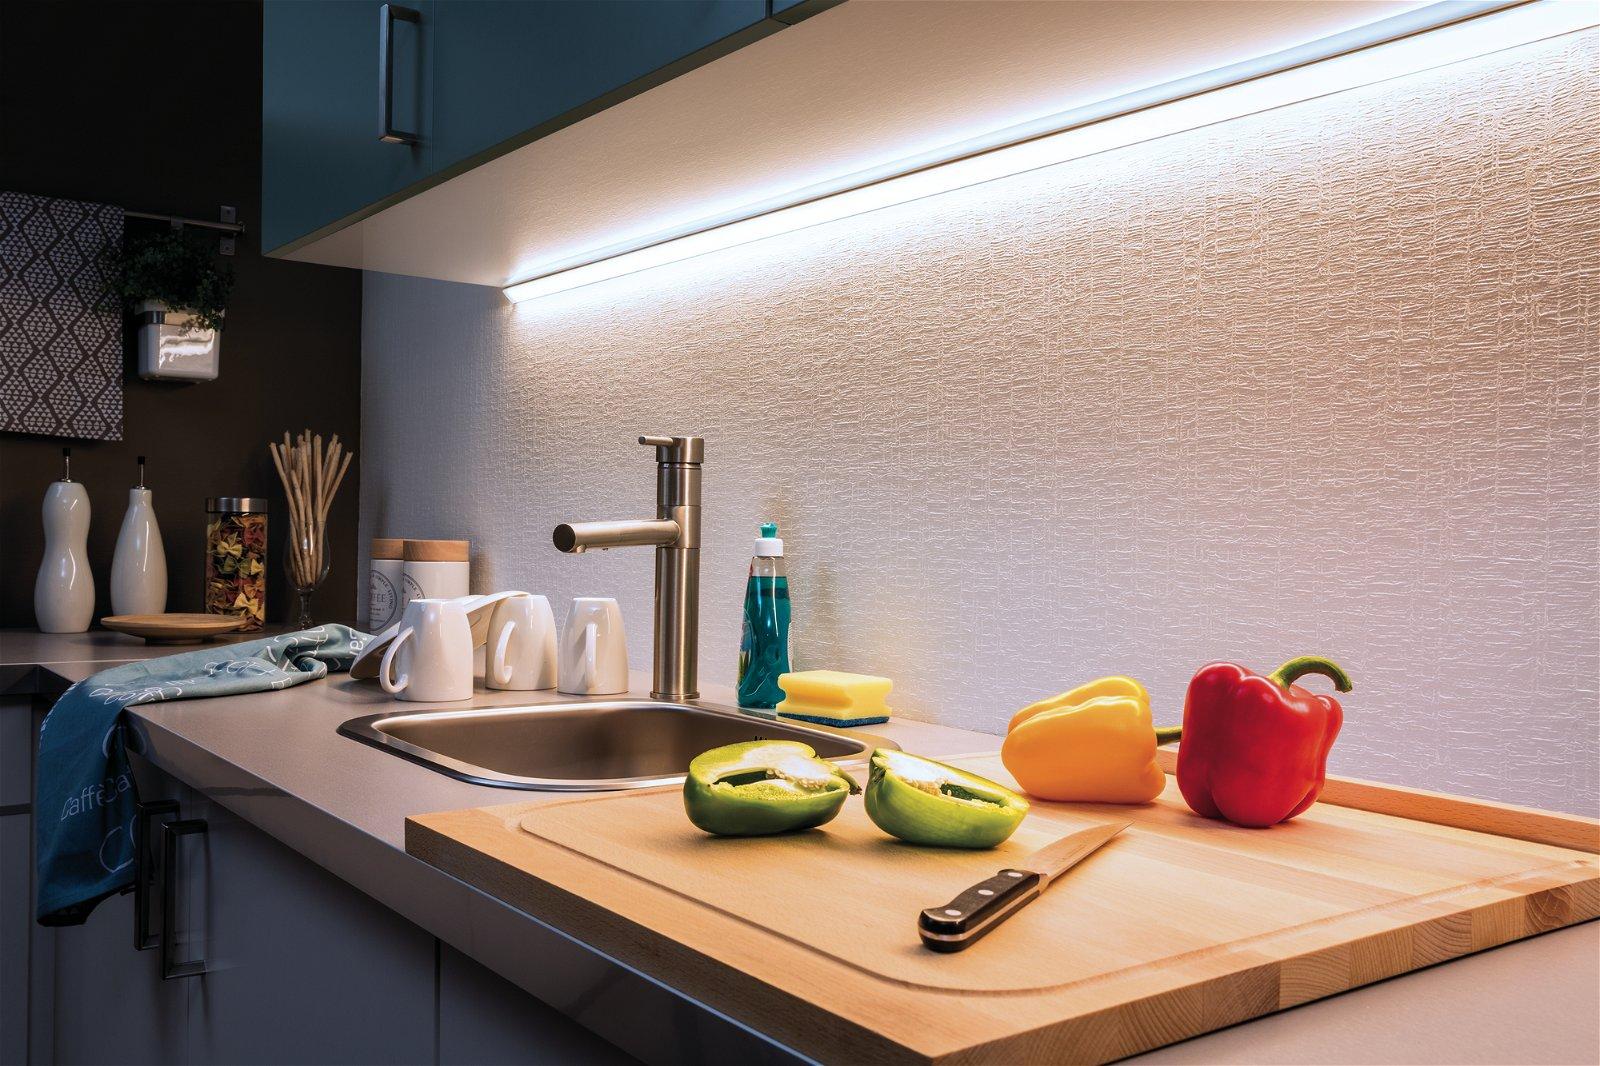 MaxLED 1000 Strip LED Blanc lumière 1,5m recouvert 18W 1650lm 6500K 20VA